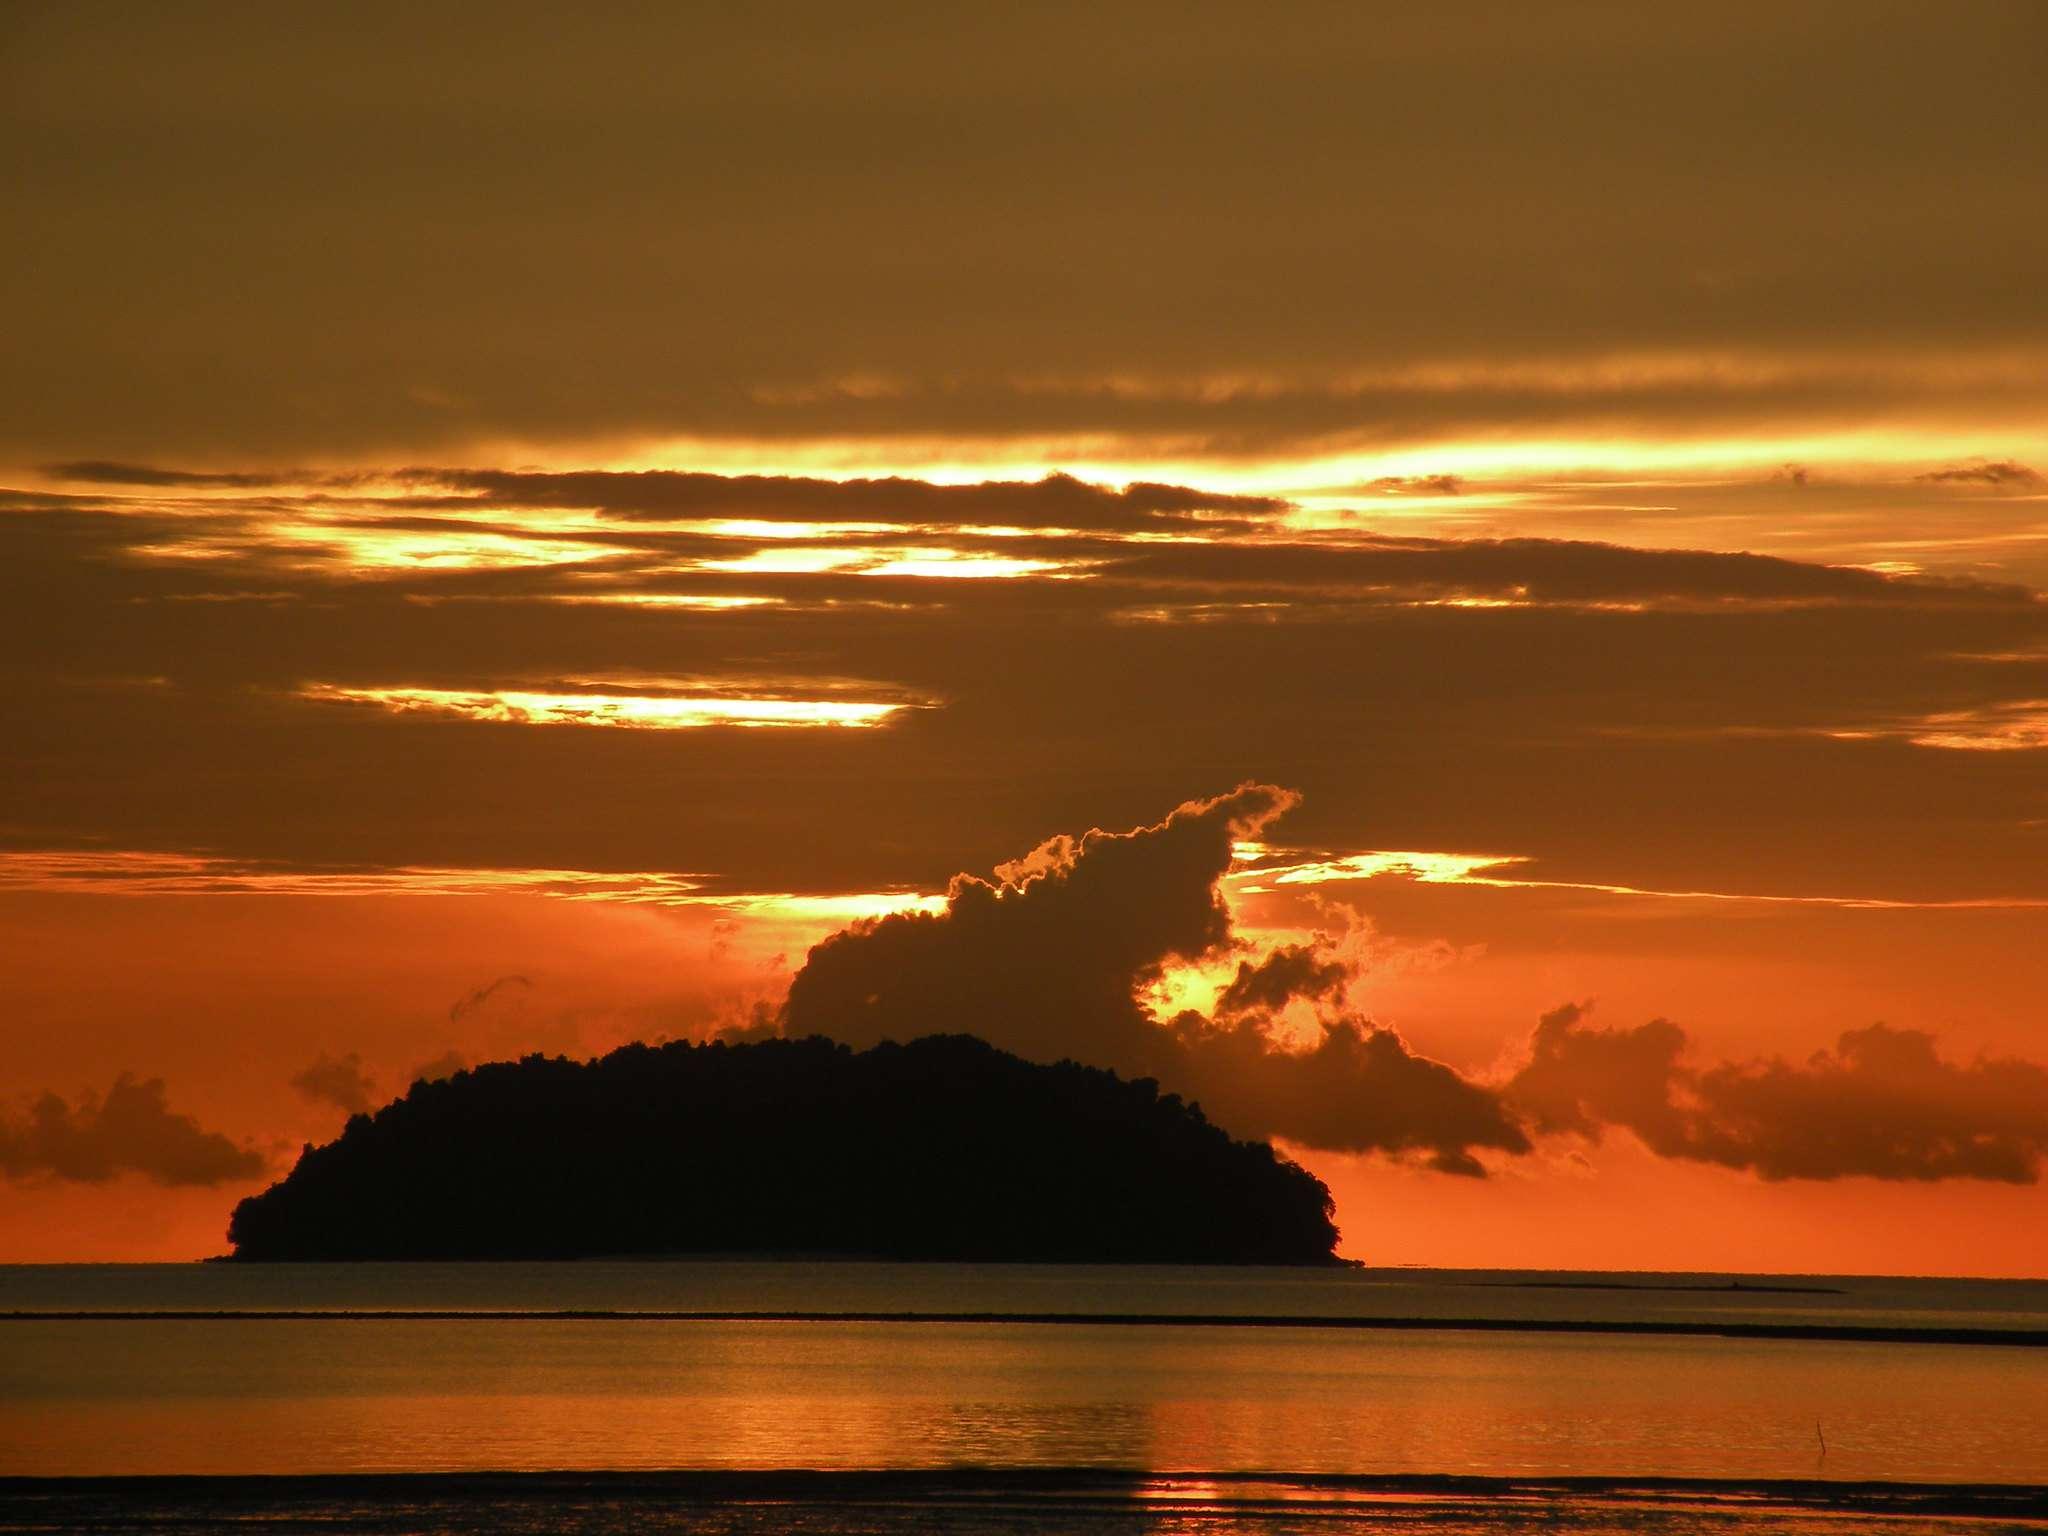 Sunset at Tanjung Aru beach, Kota Kinabalu, Borneo